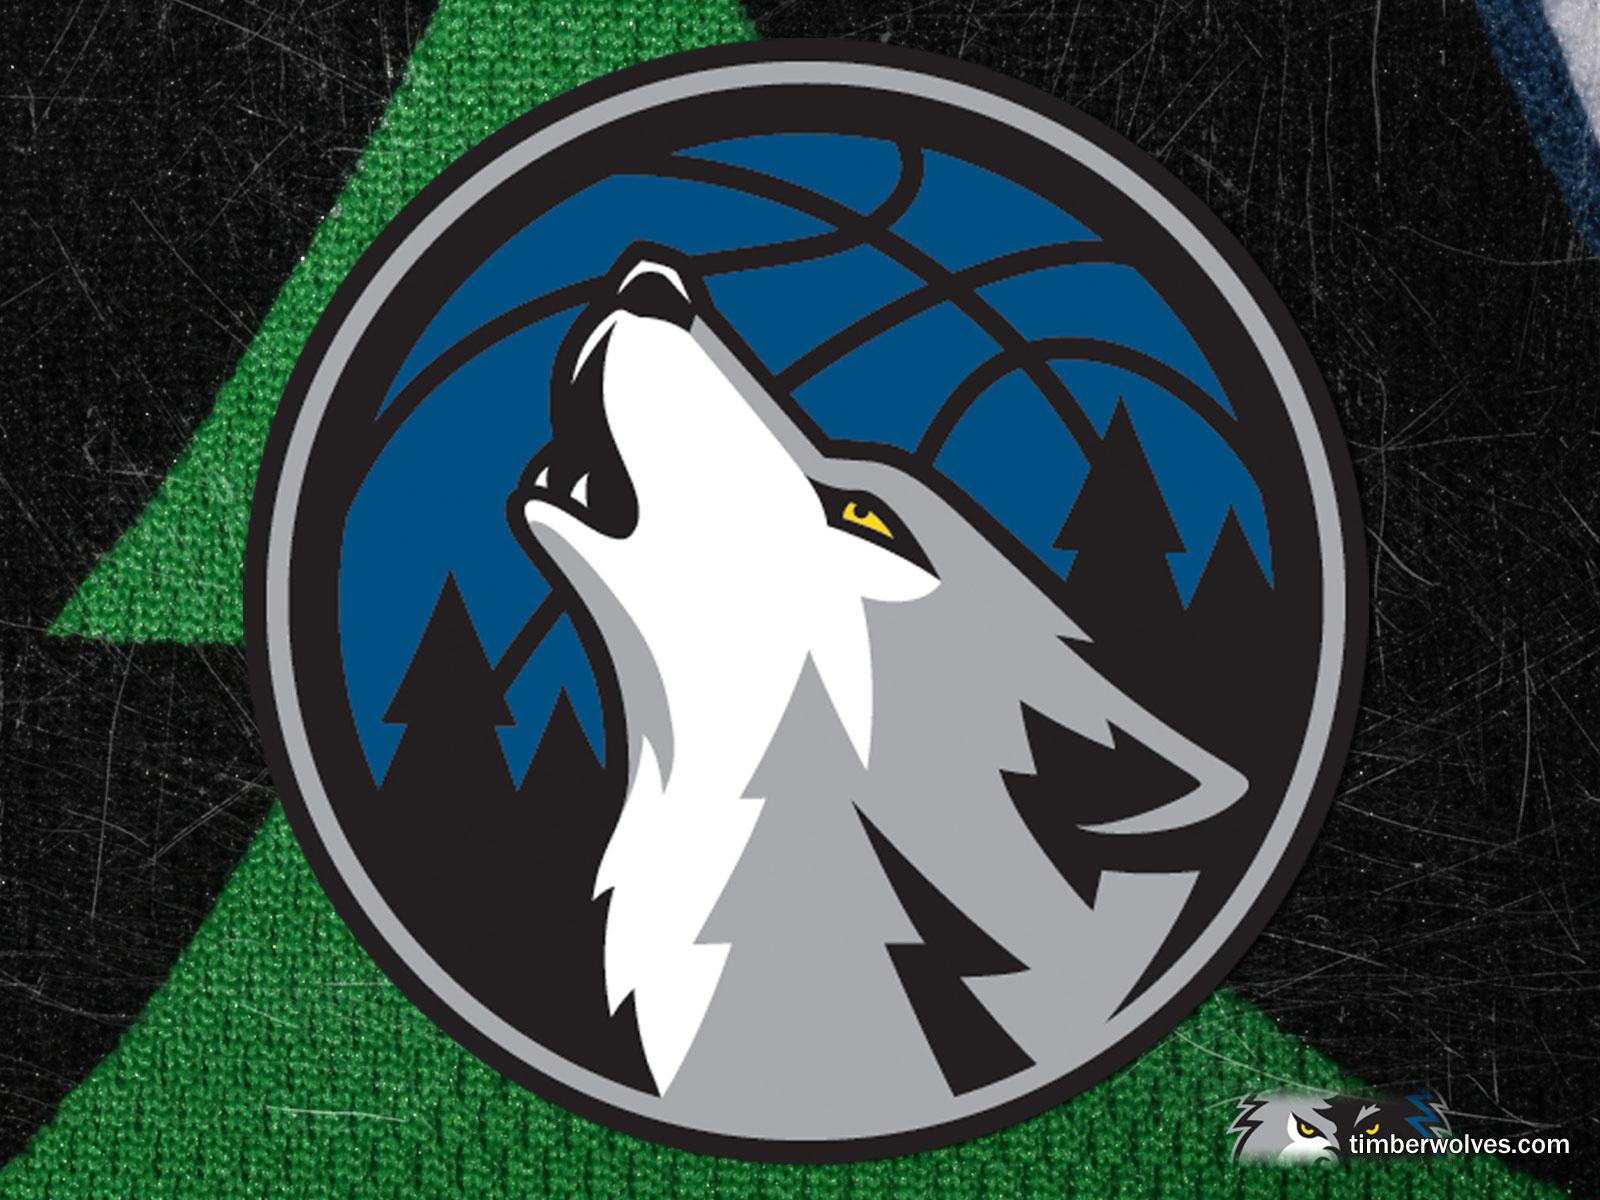 Minnesota timberwolves logo wallpapers   SF Wallpaper 1600x1200